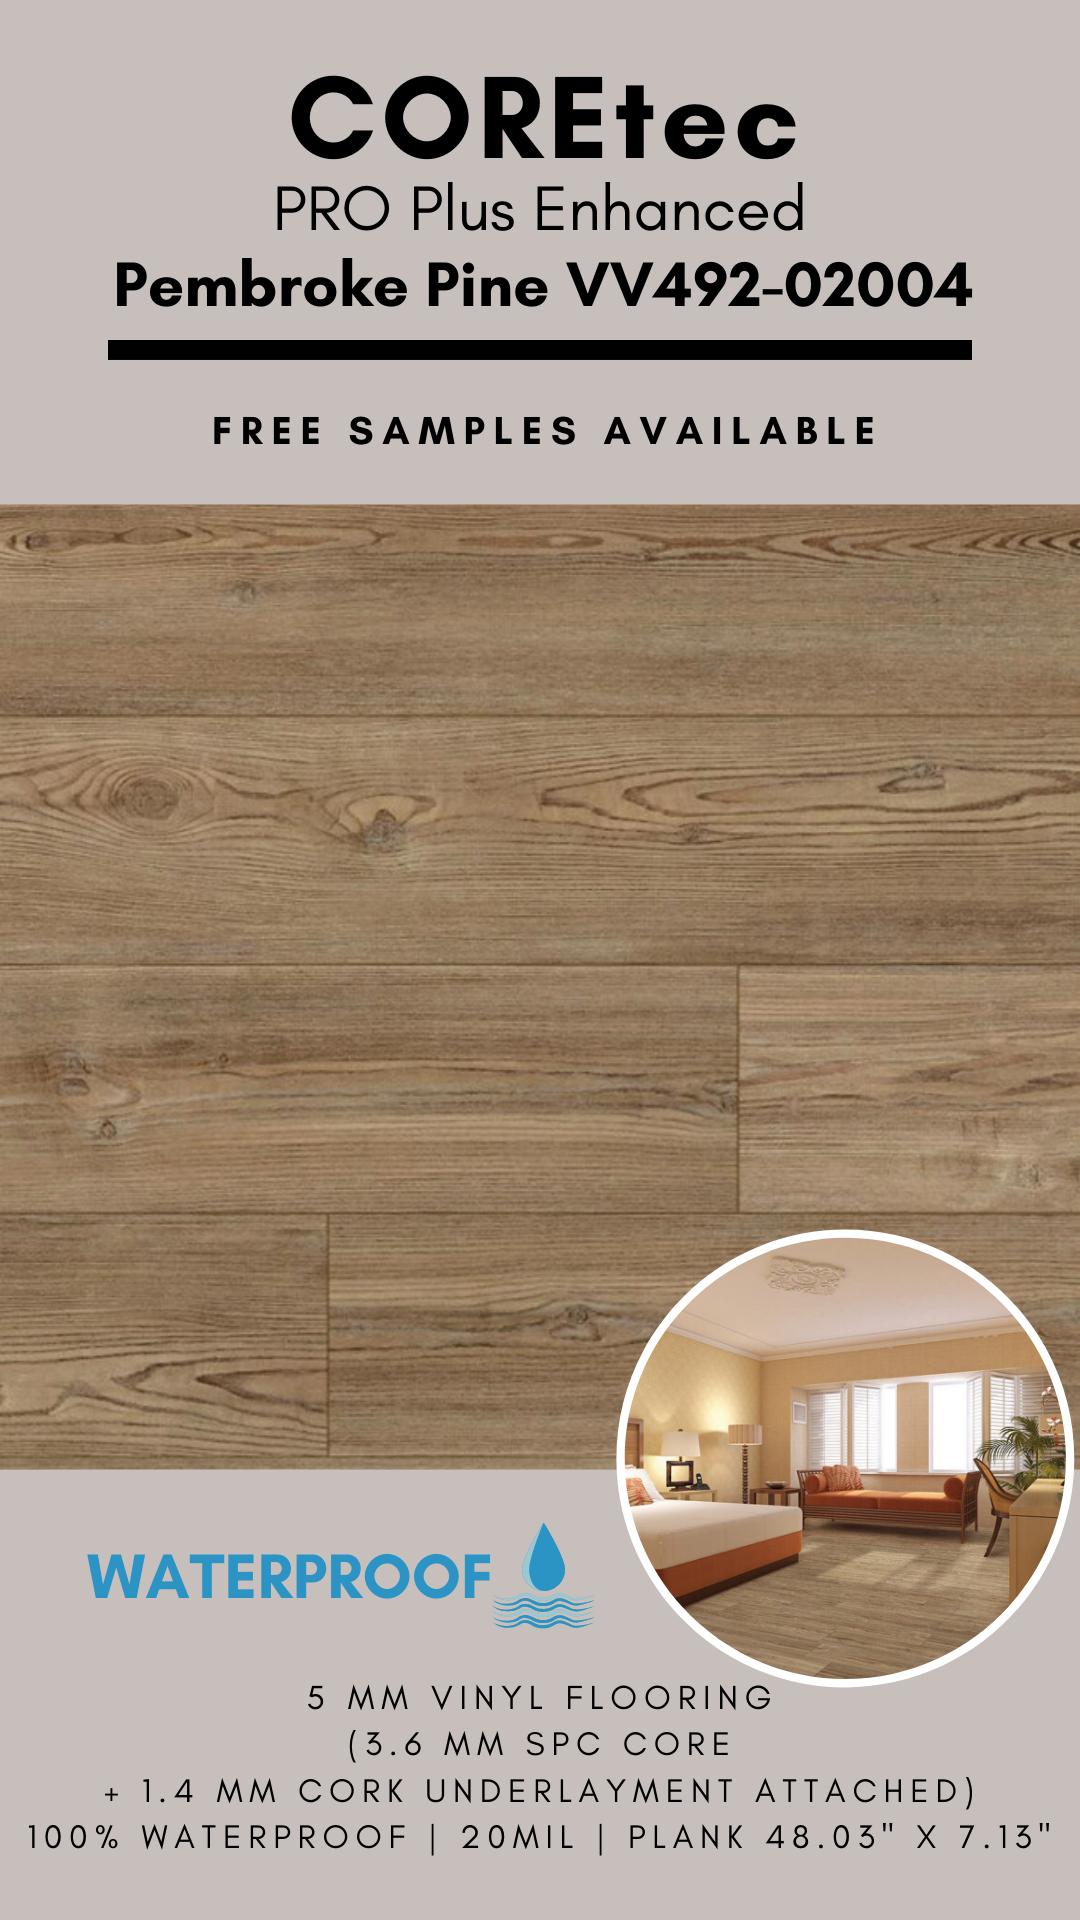 Coretec Pro Plus Enhanced Pembroke Pine Vinyl Flooring In 2020 Vinyl Flooring Flooring Pembroke